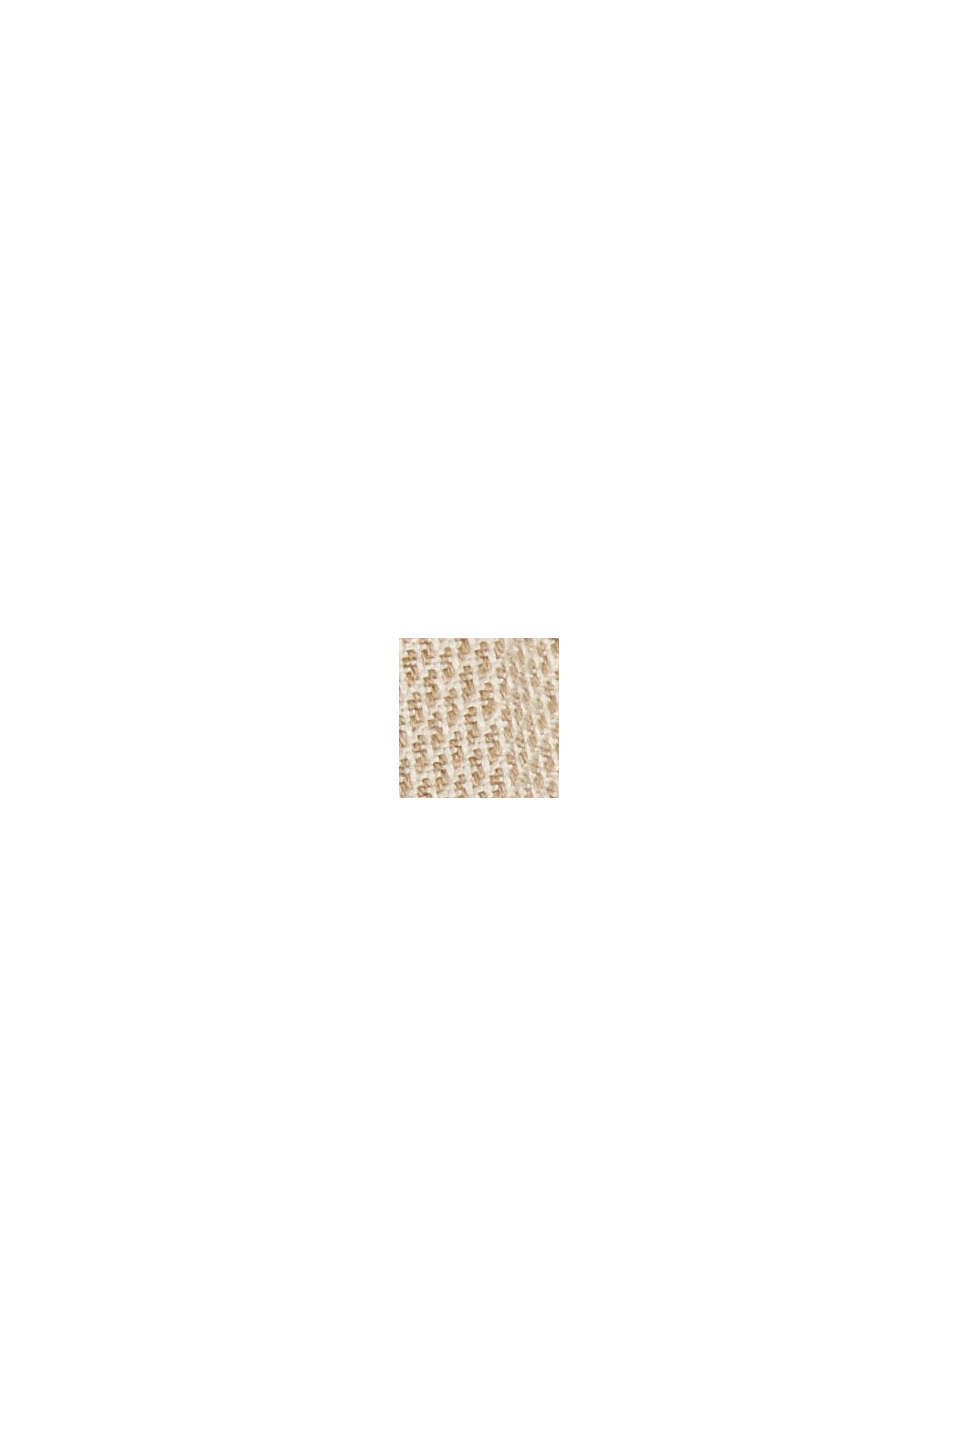 SMART SPRING Mix + Match stretch blazer, BEIGE, swatch